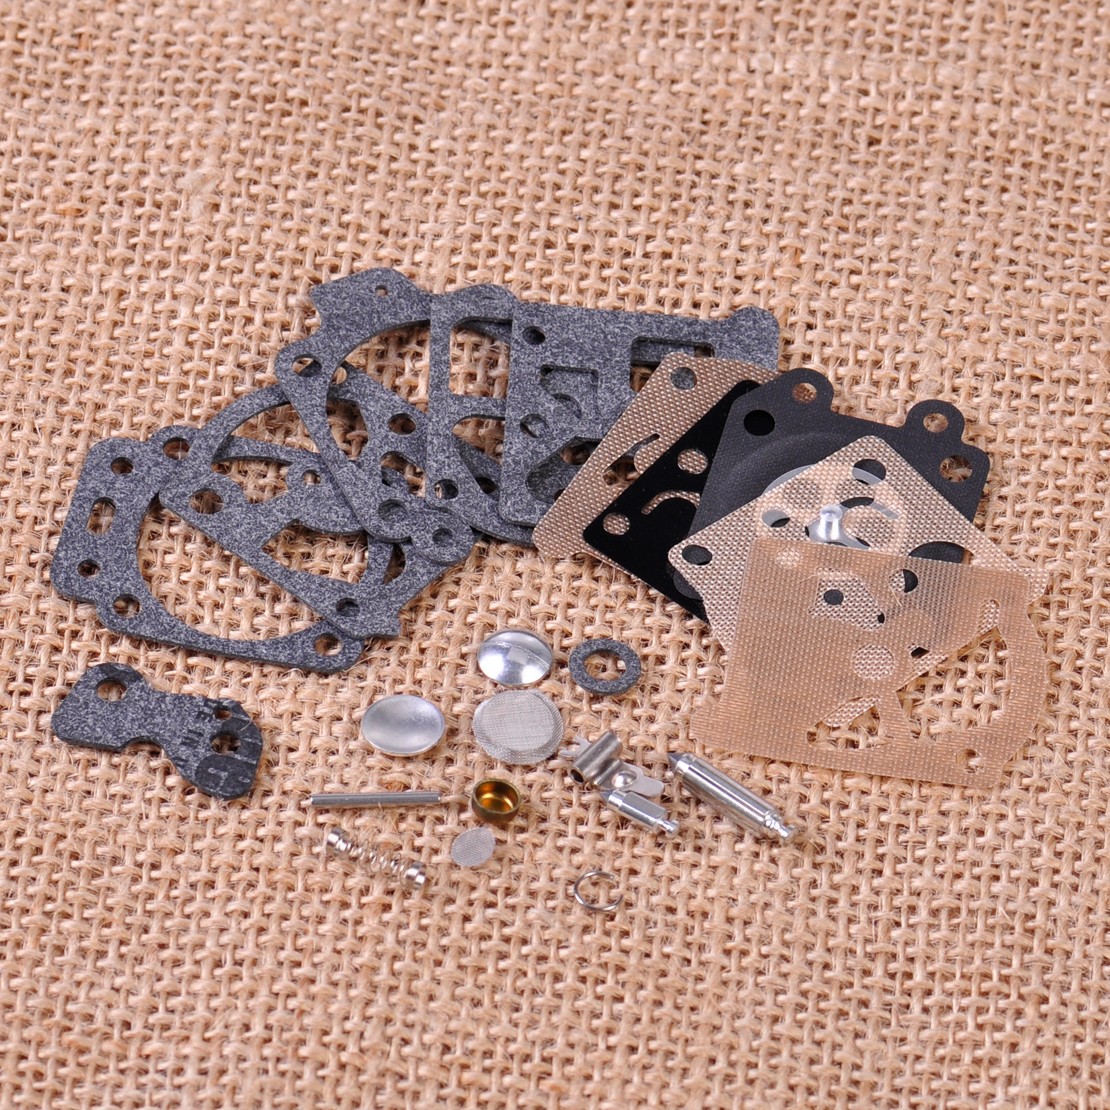 LETAOSK Carburetor Repair Kit Carb Gasket Rebuild Tool Gasket Set Diaphragm Fit For Walbro K20-WAT WA WT Series